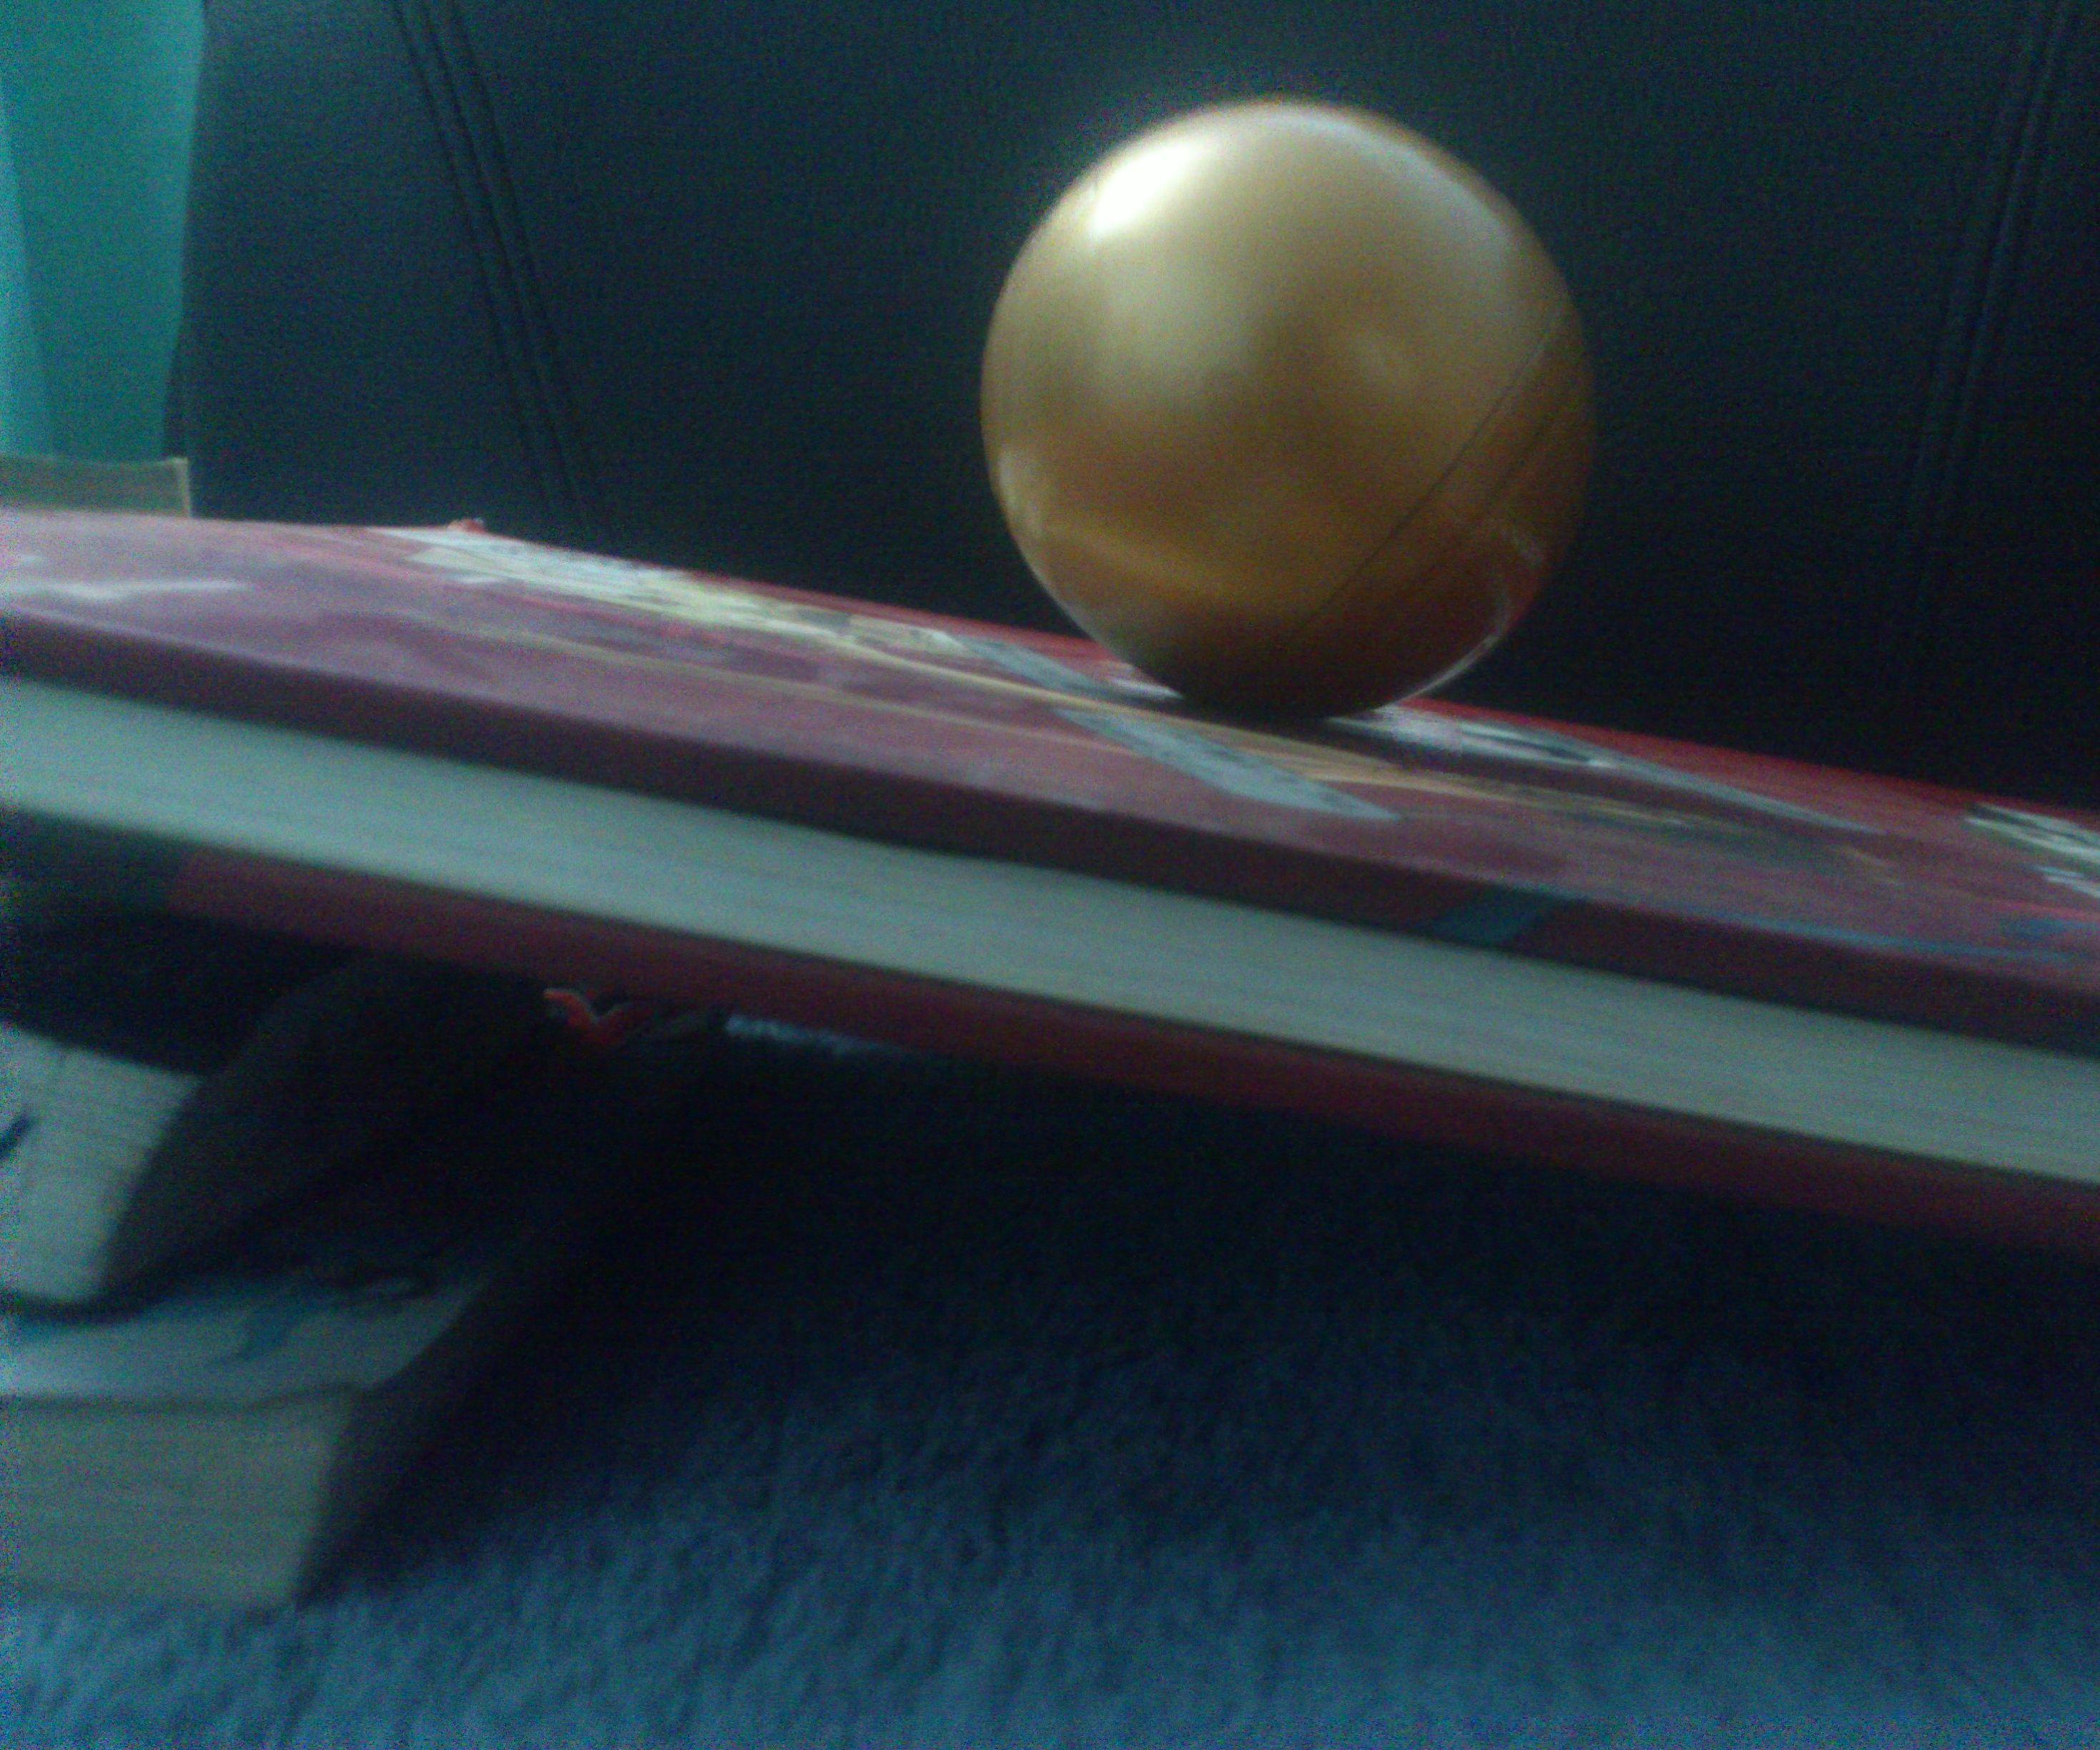 Gravity defying ball